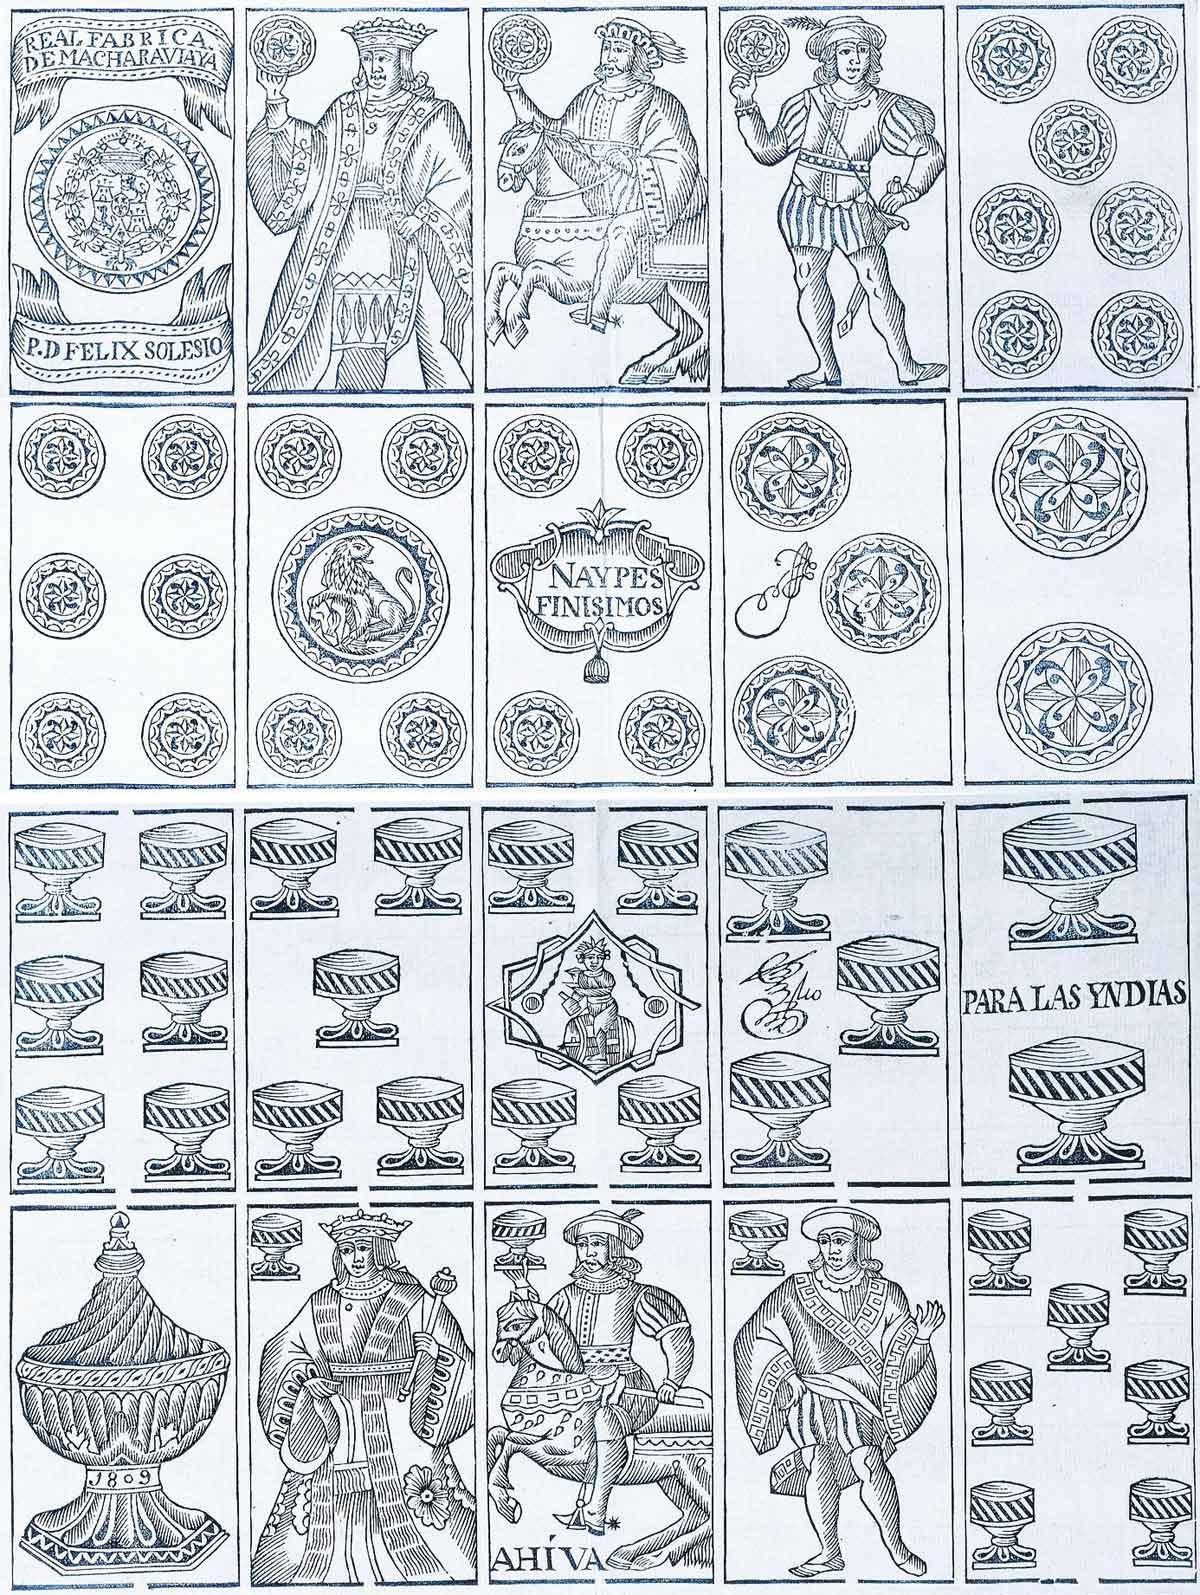 Spanish National pattern, Real Fábrica de Macharaviaya, 1809